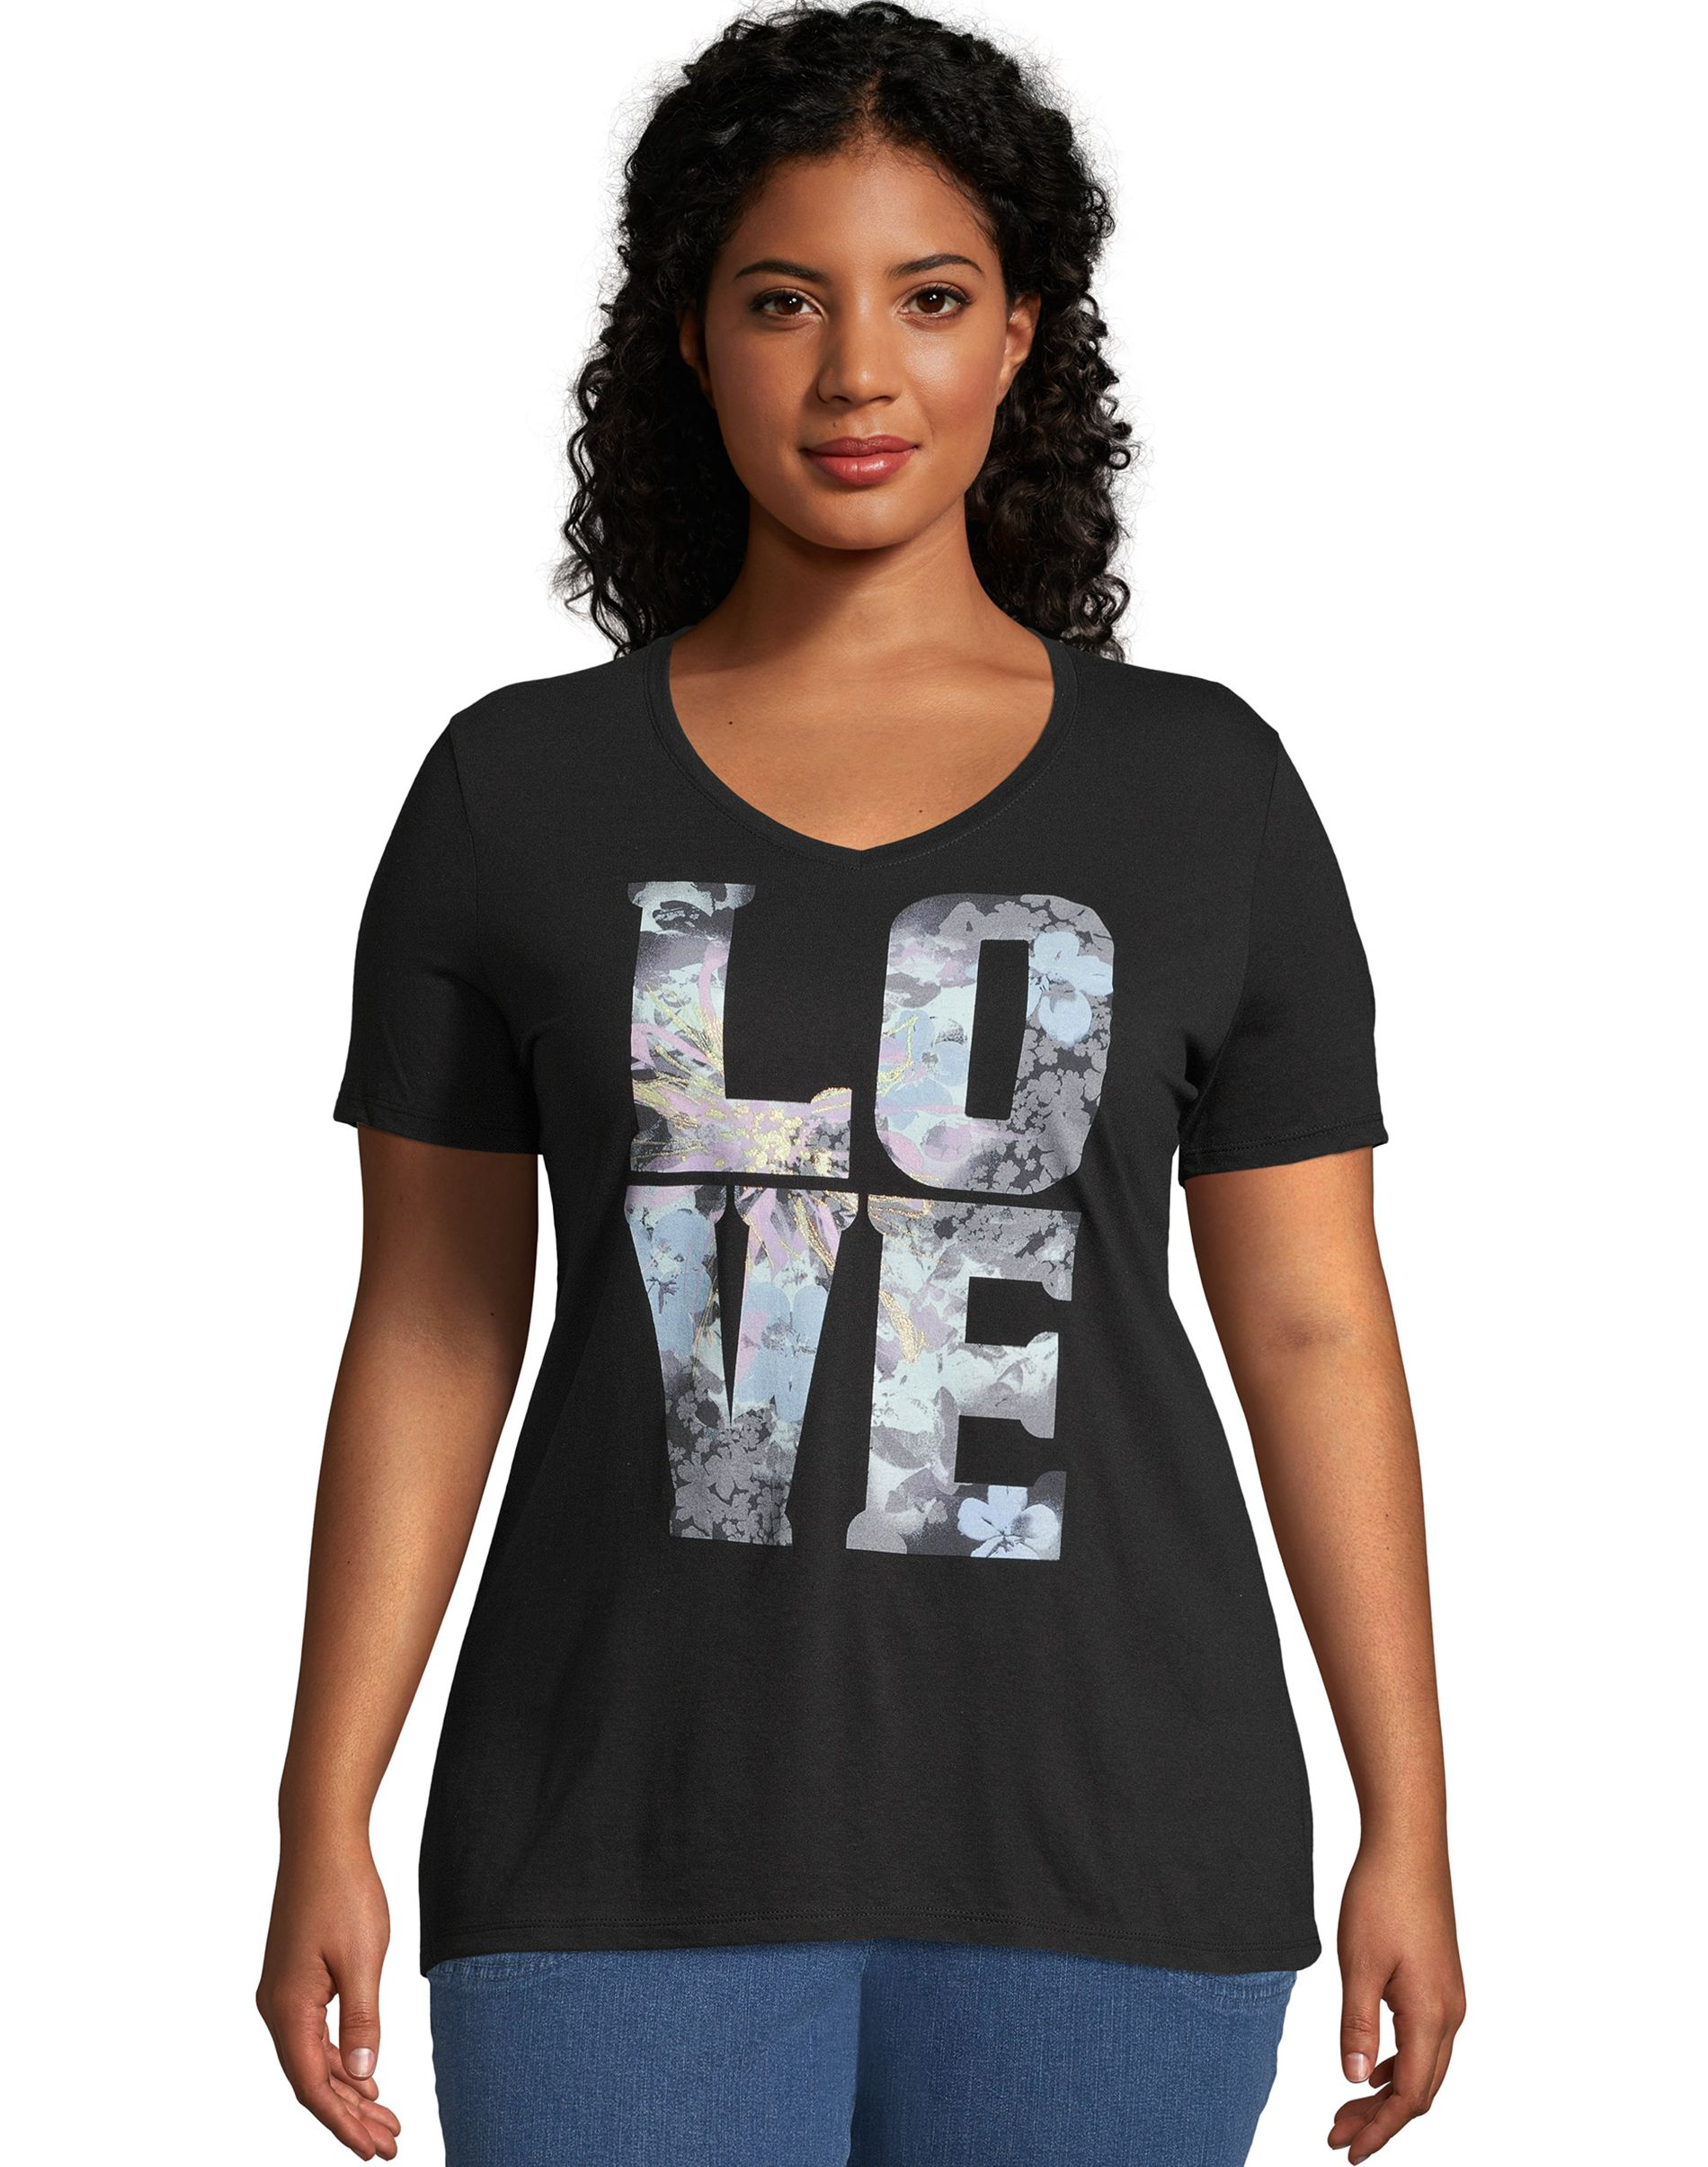 JMS Big Love Short Sleeve Graphic Tee women Just My Size